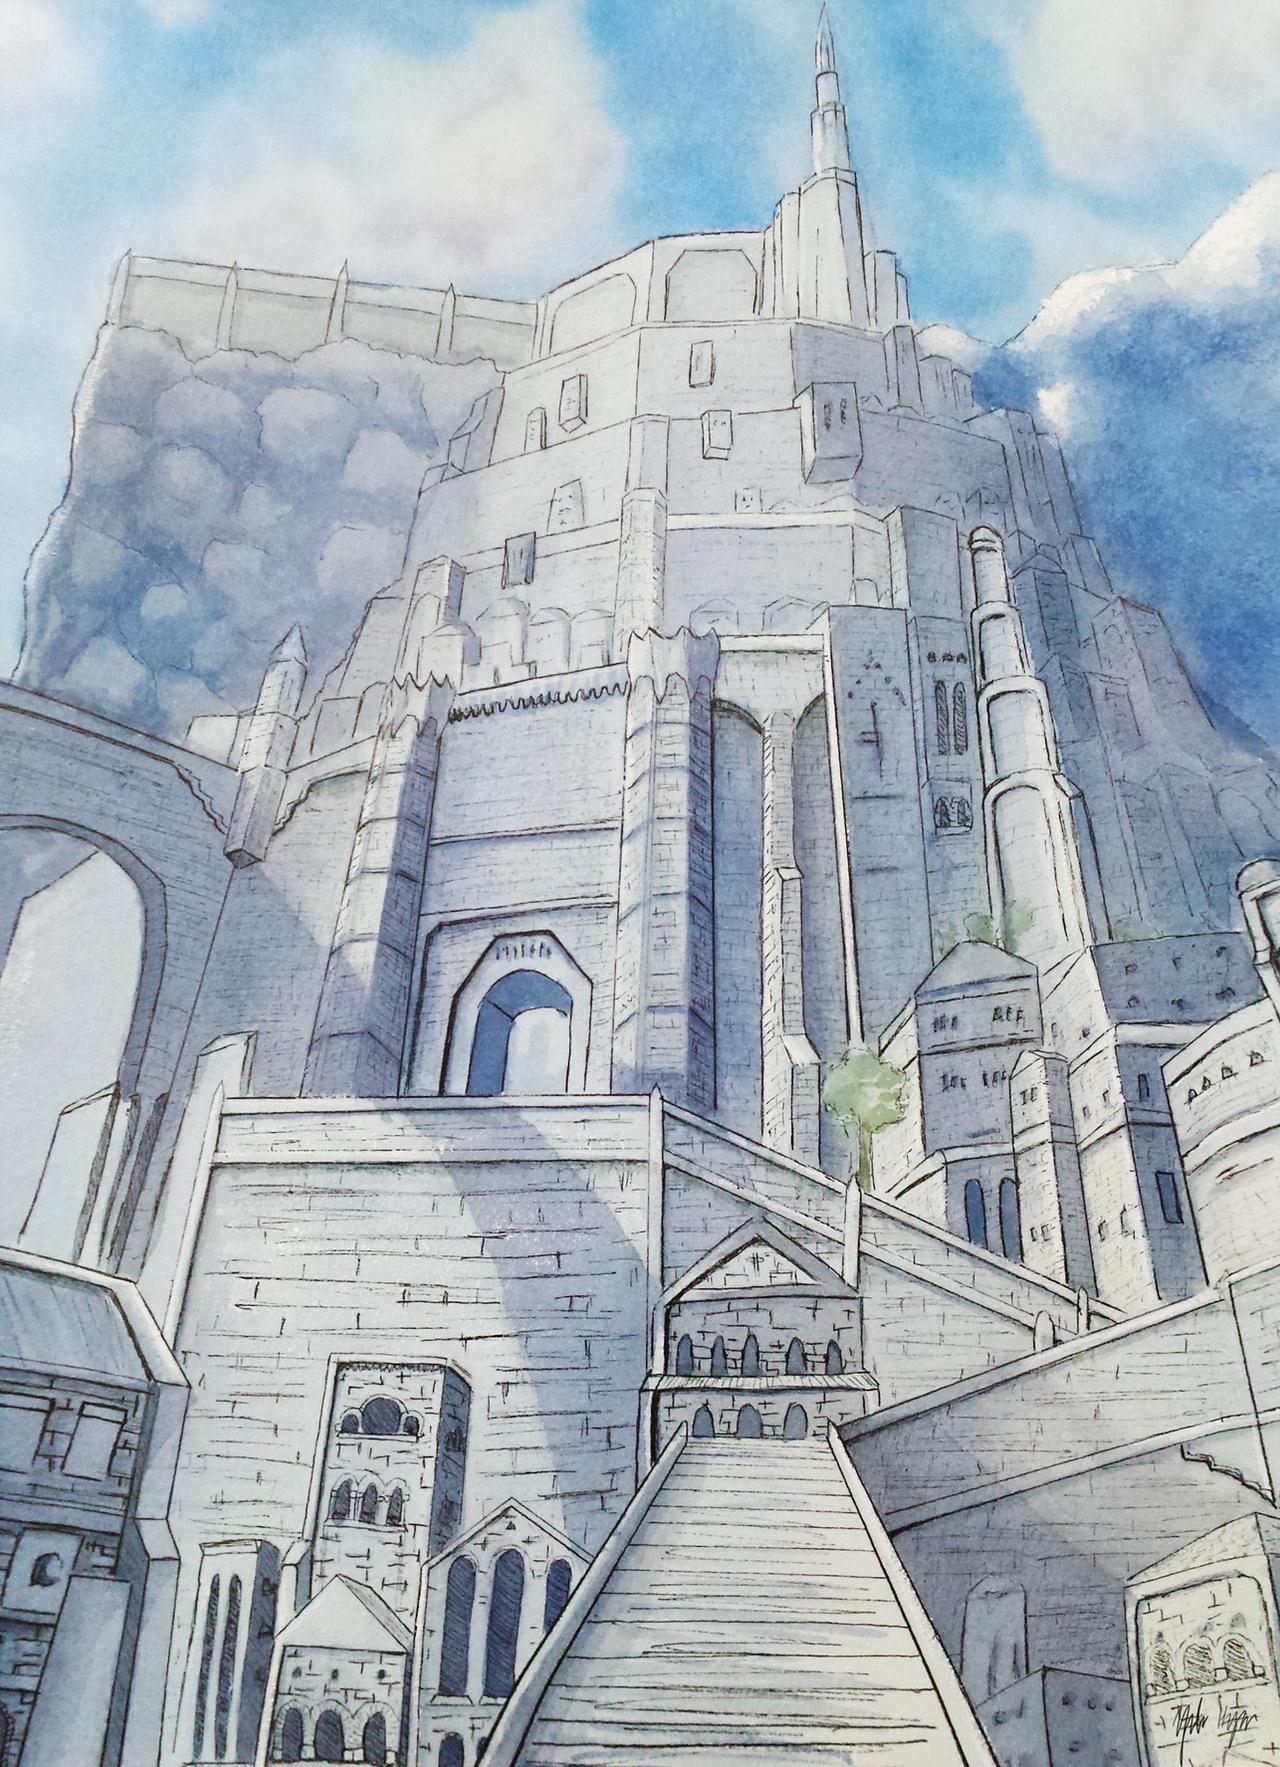 Minas Tirith by yuforawesome